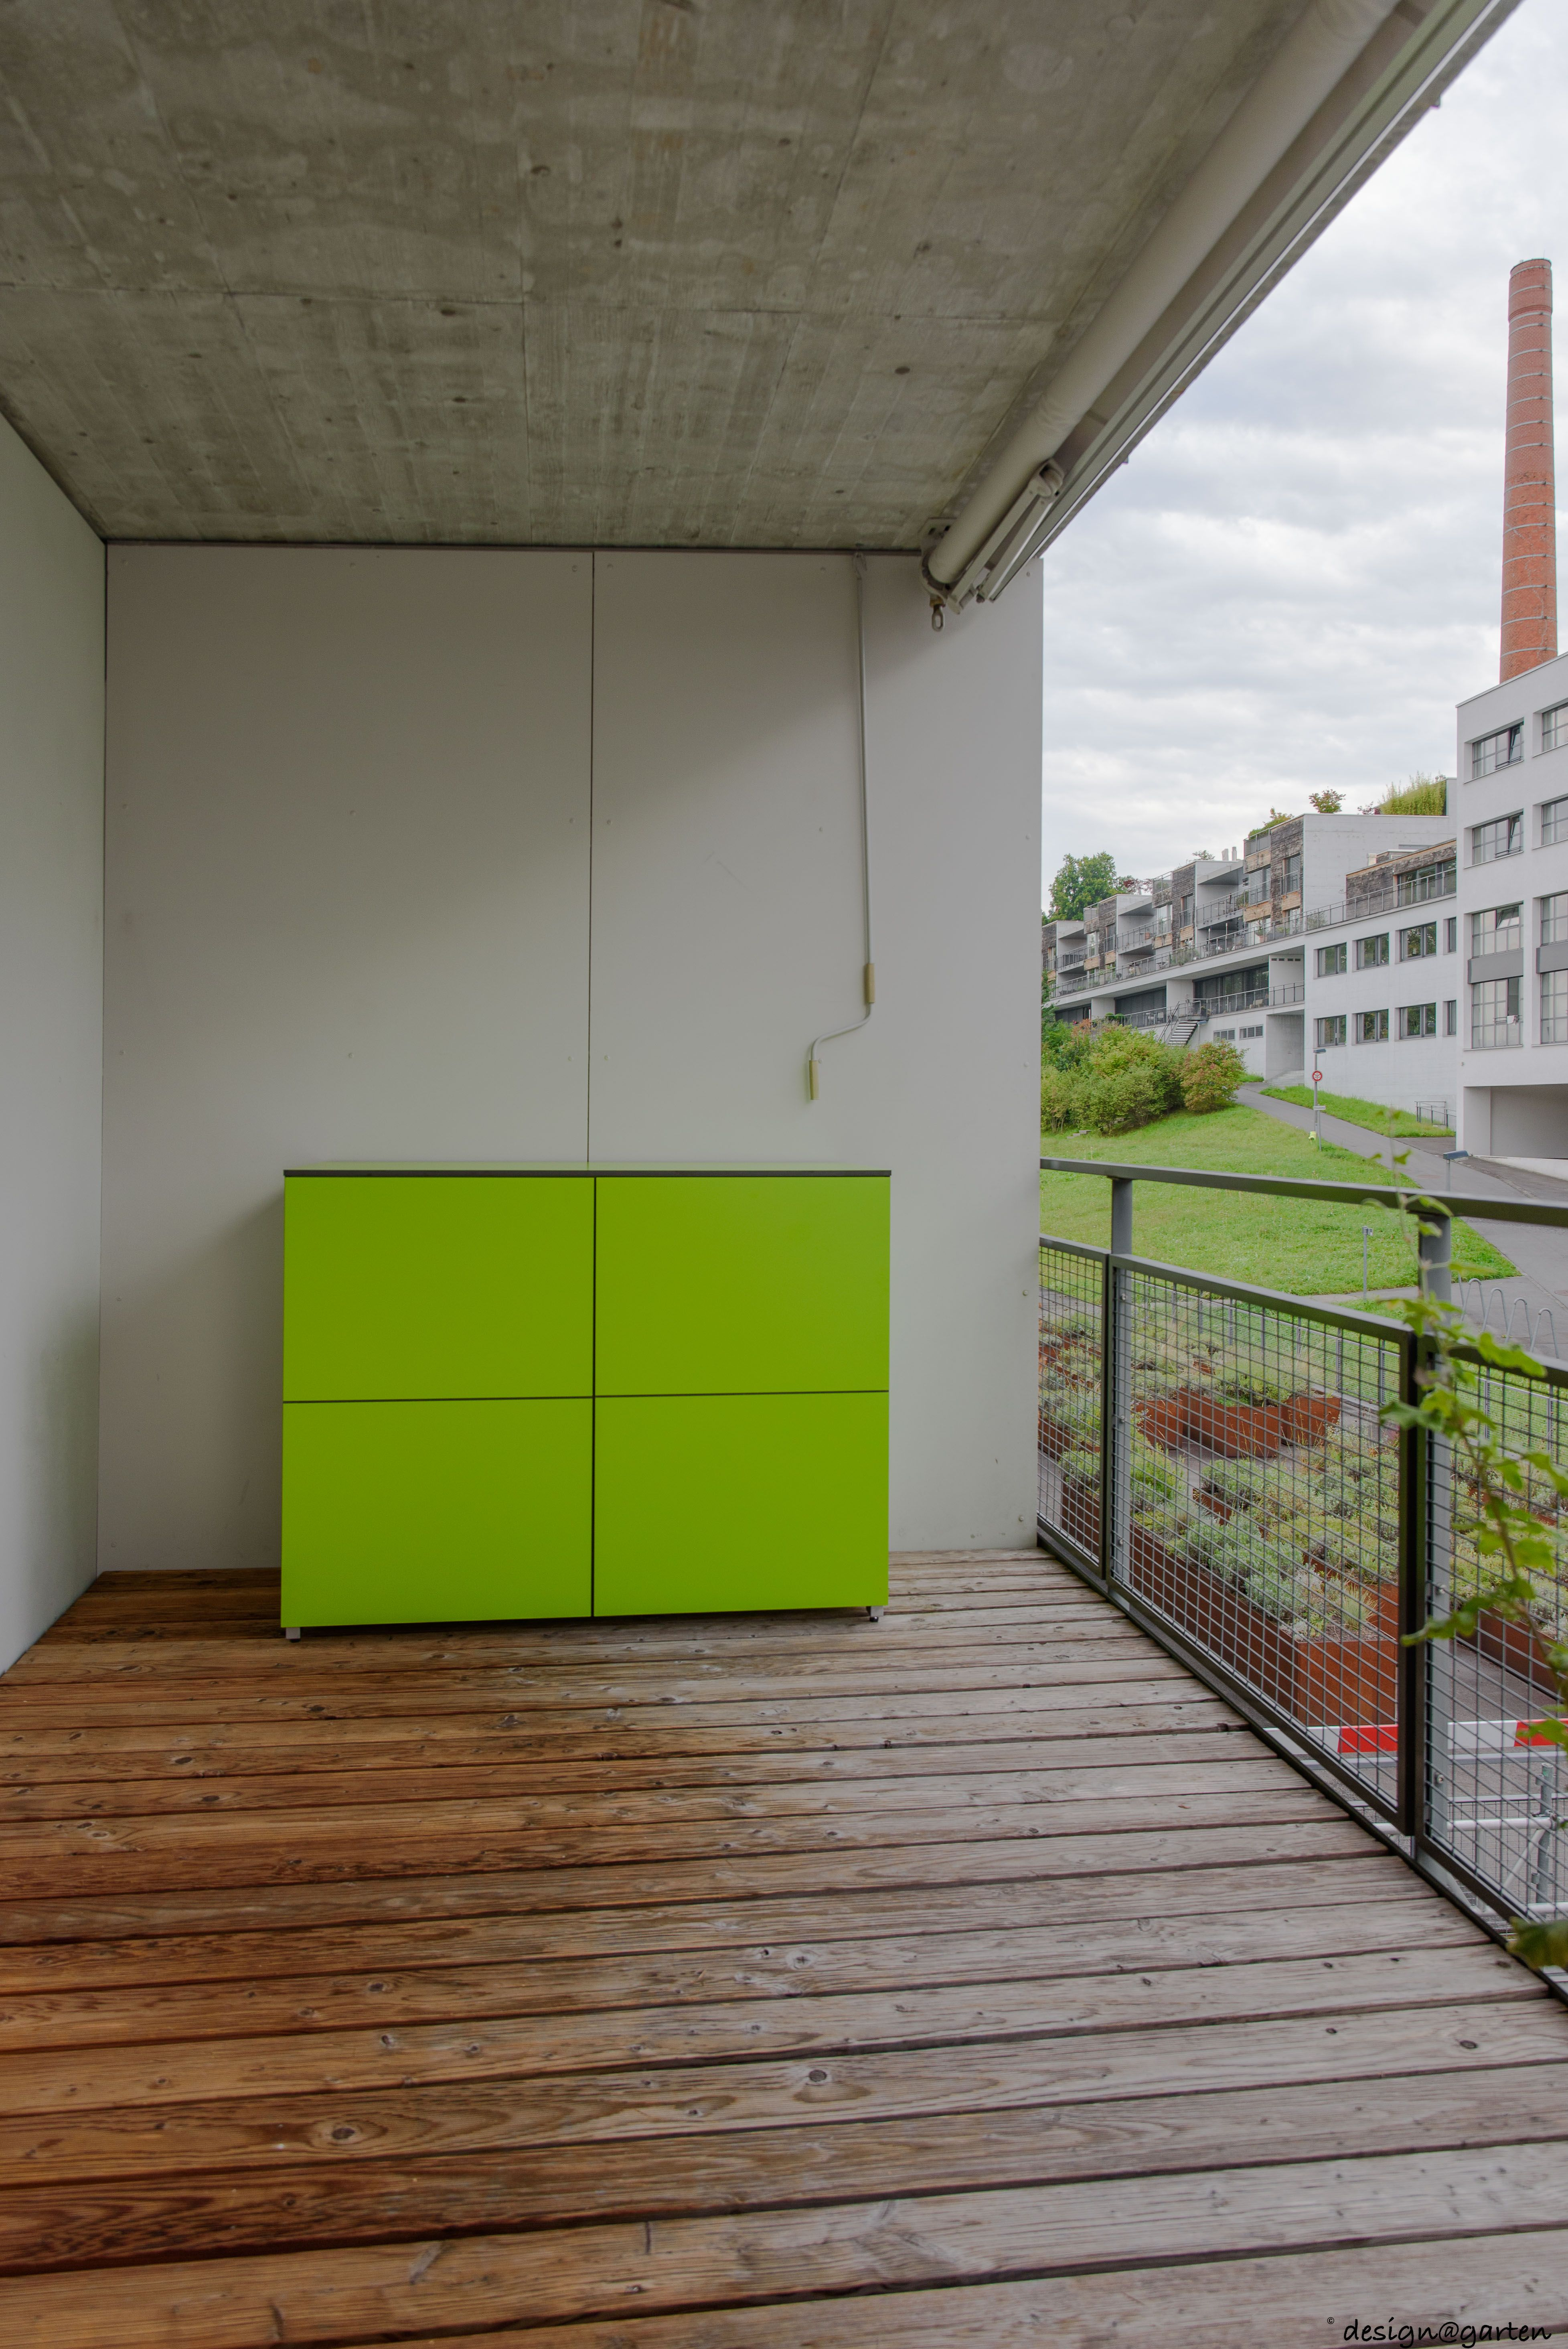 Balkonschrank Win In Wadenswil By Design Garten Augsburg Lime Green Wetterfest Uv Bestandig Terrassensc Gartenschrank Balkonschrank Terrasse